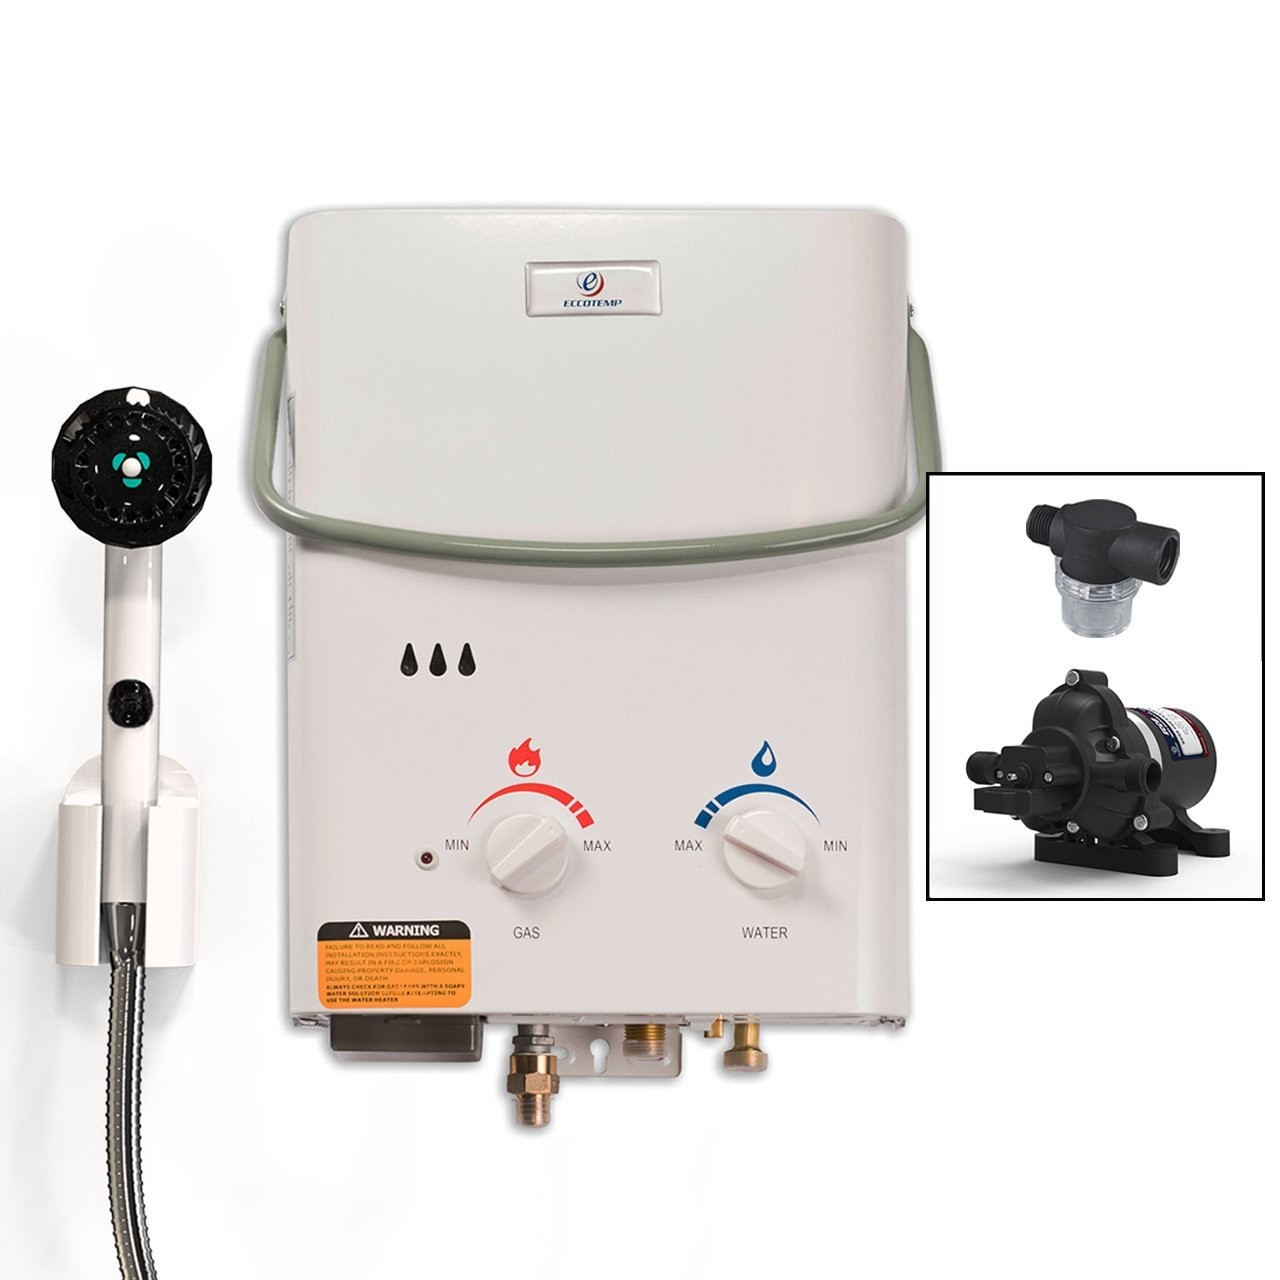 Amazon Eccotemp L5 Tankless Water Heater w EccoFlo Pump & Strainer Sports & Outdoors